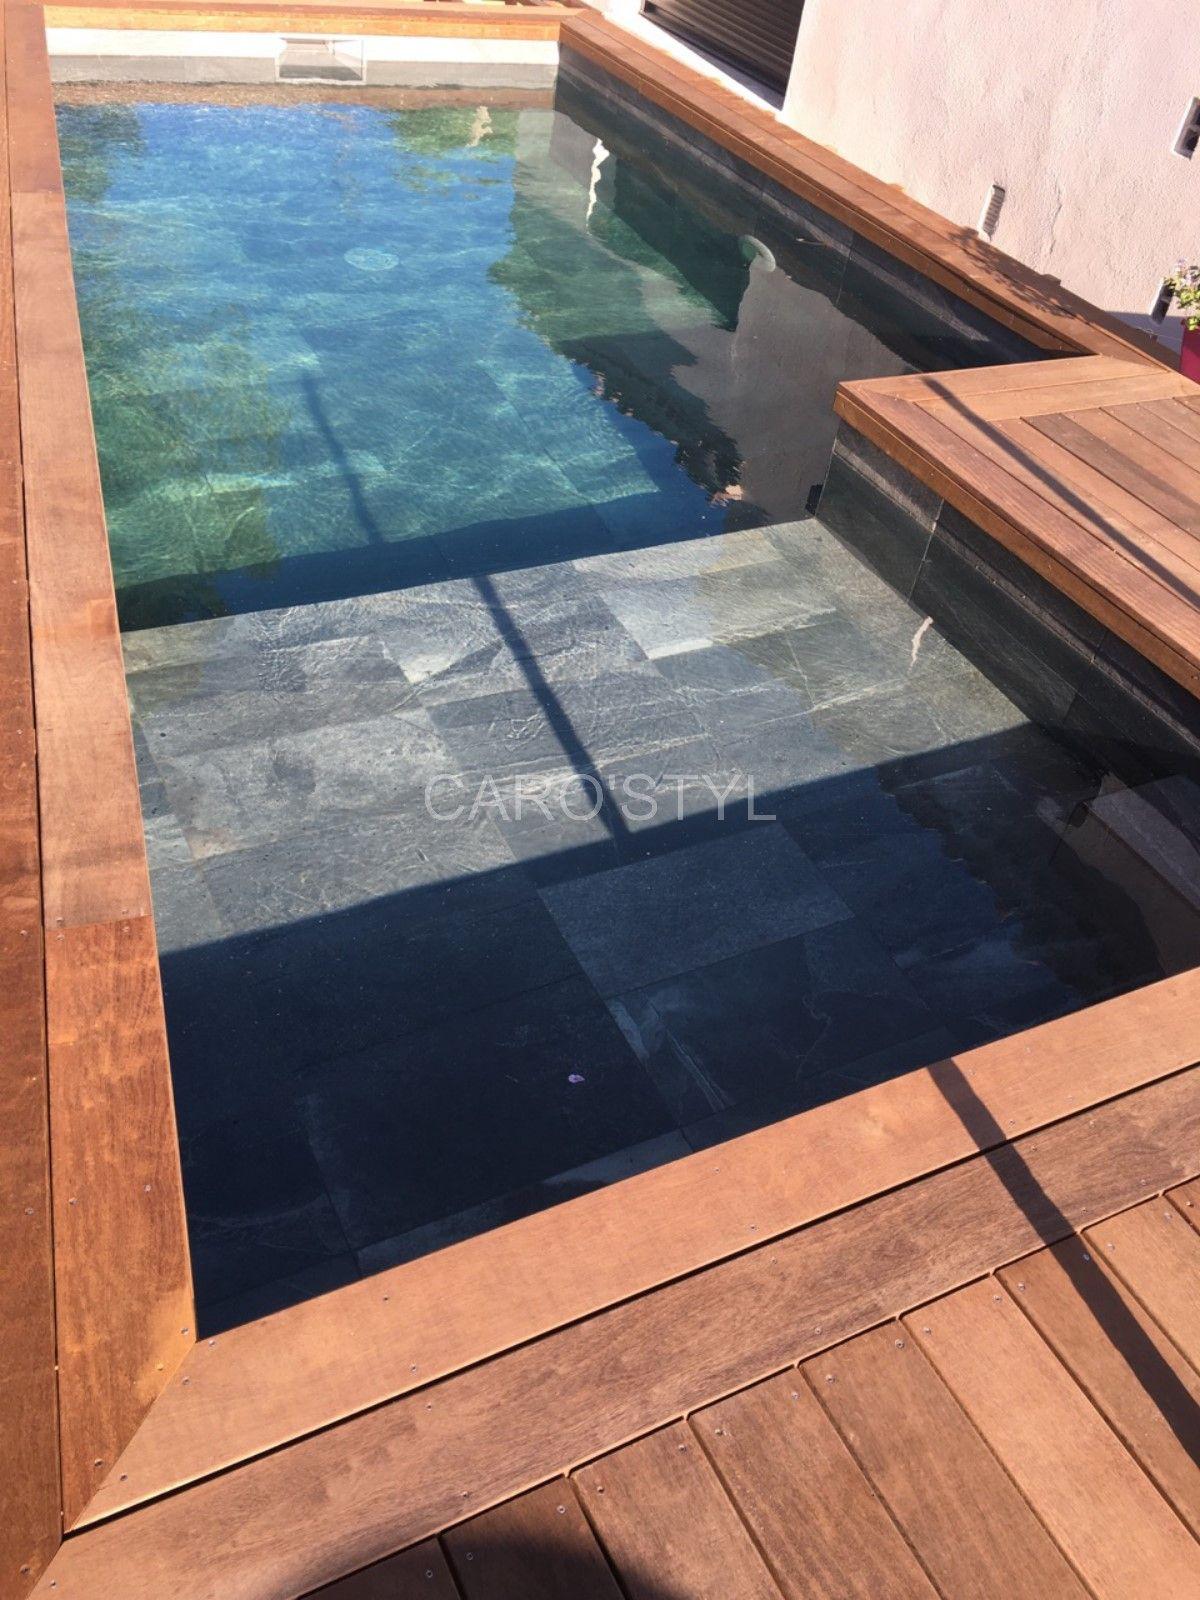 Une piscine tr s tendance en ardoise noire carrelage et salle de bain la seyne var caro styl - Salle de bain en ardoise ...